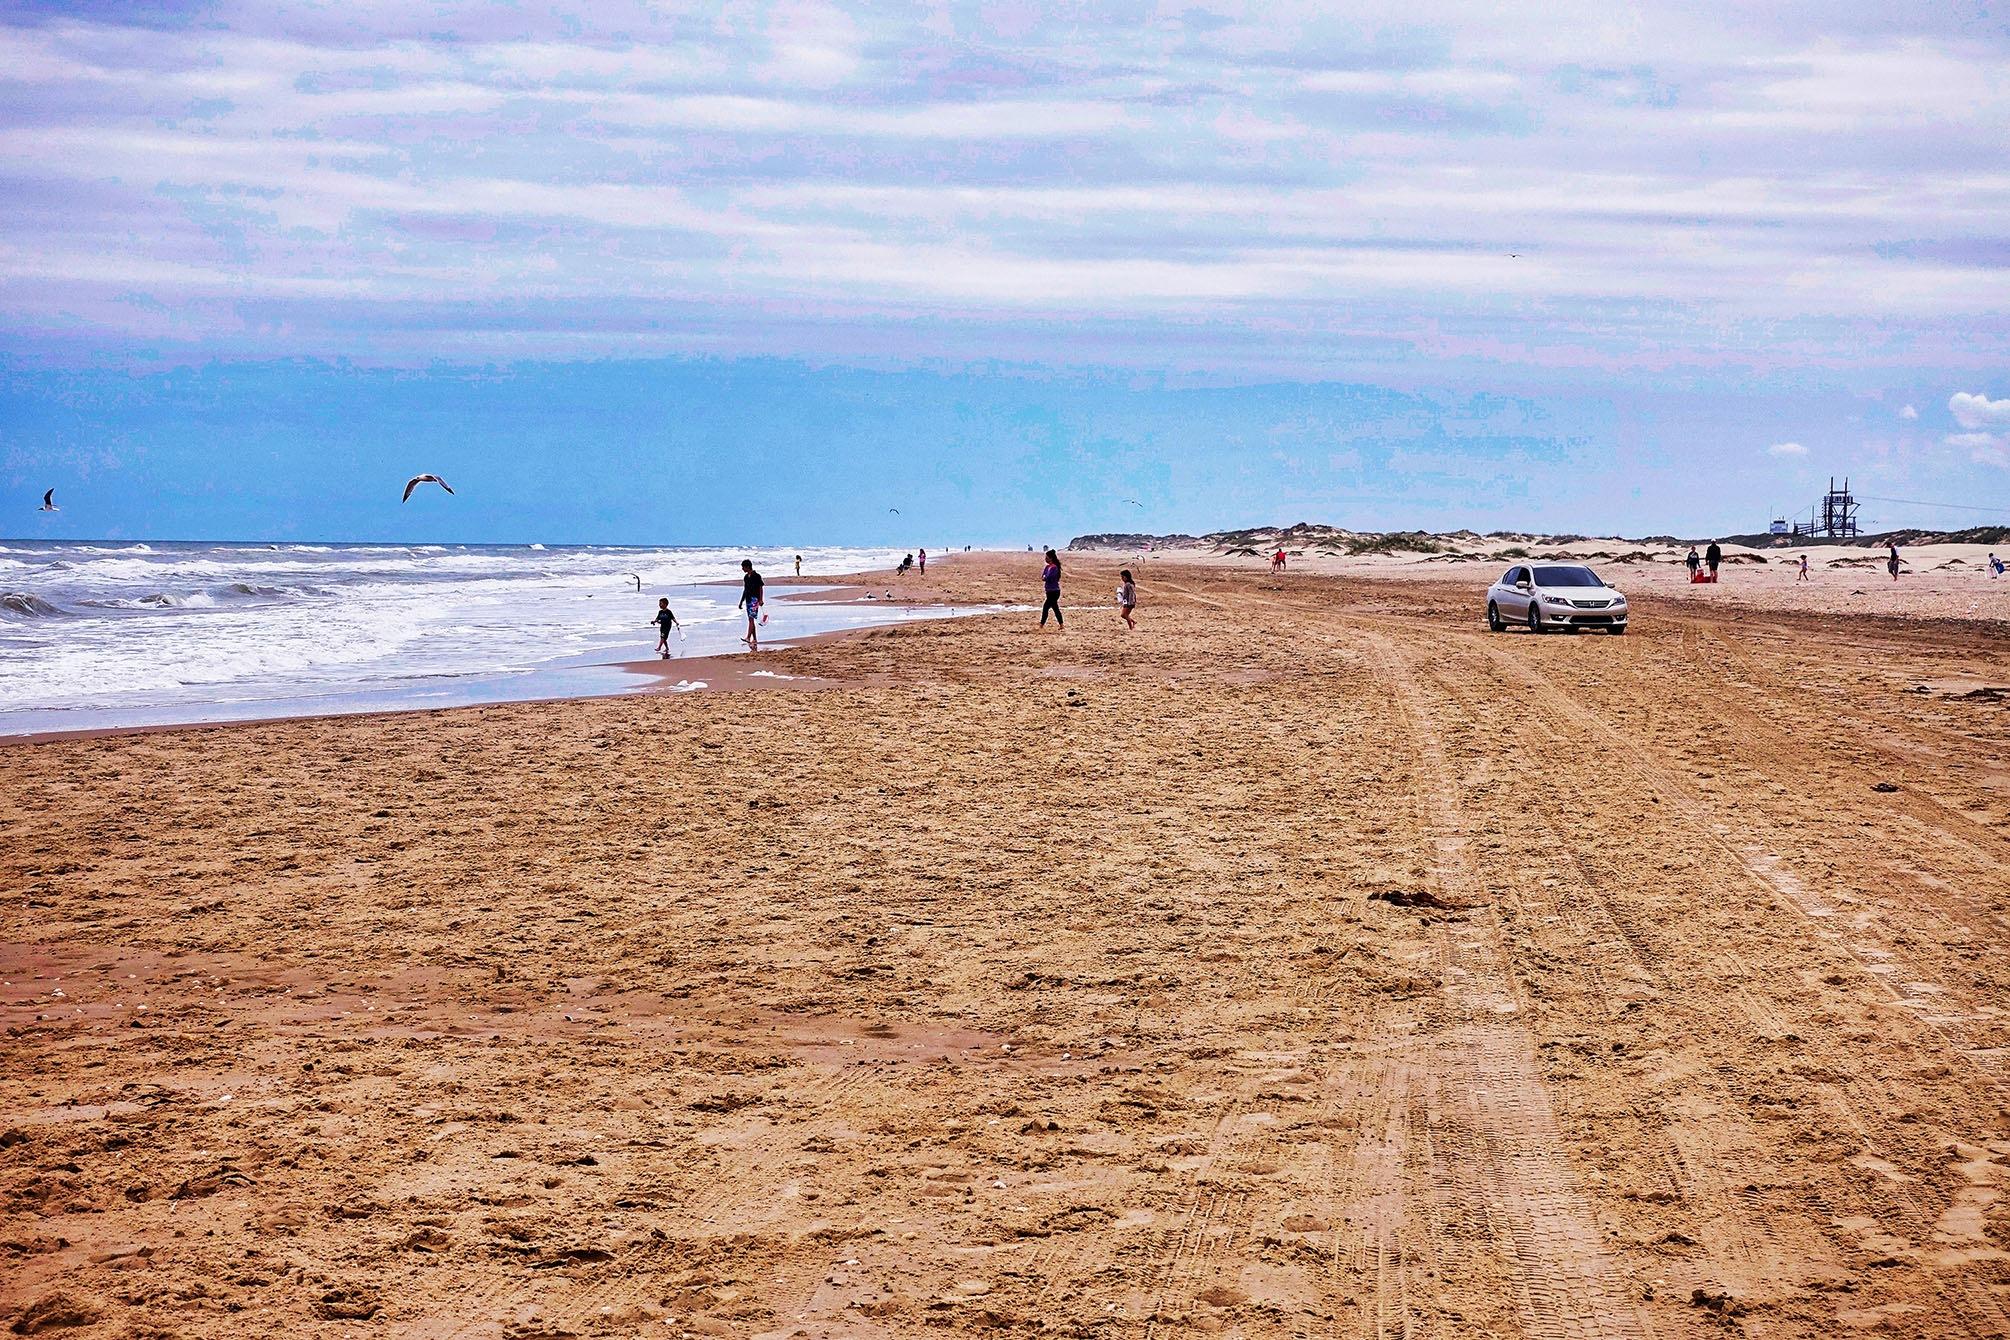 Beach by Erwin Widmer